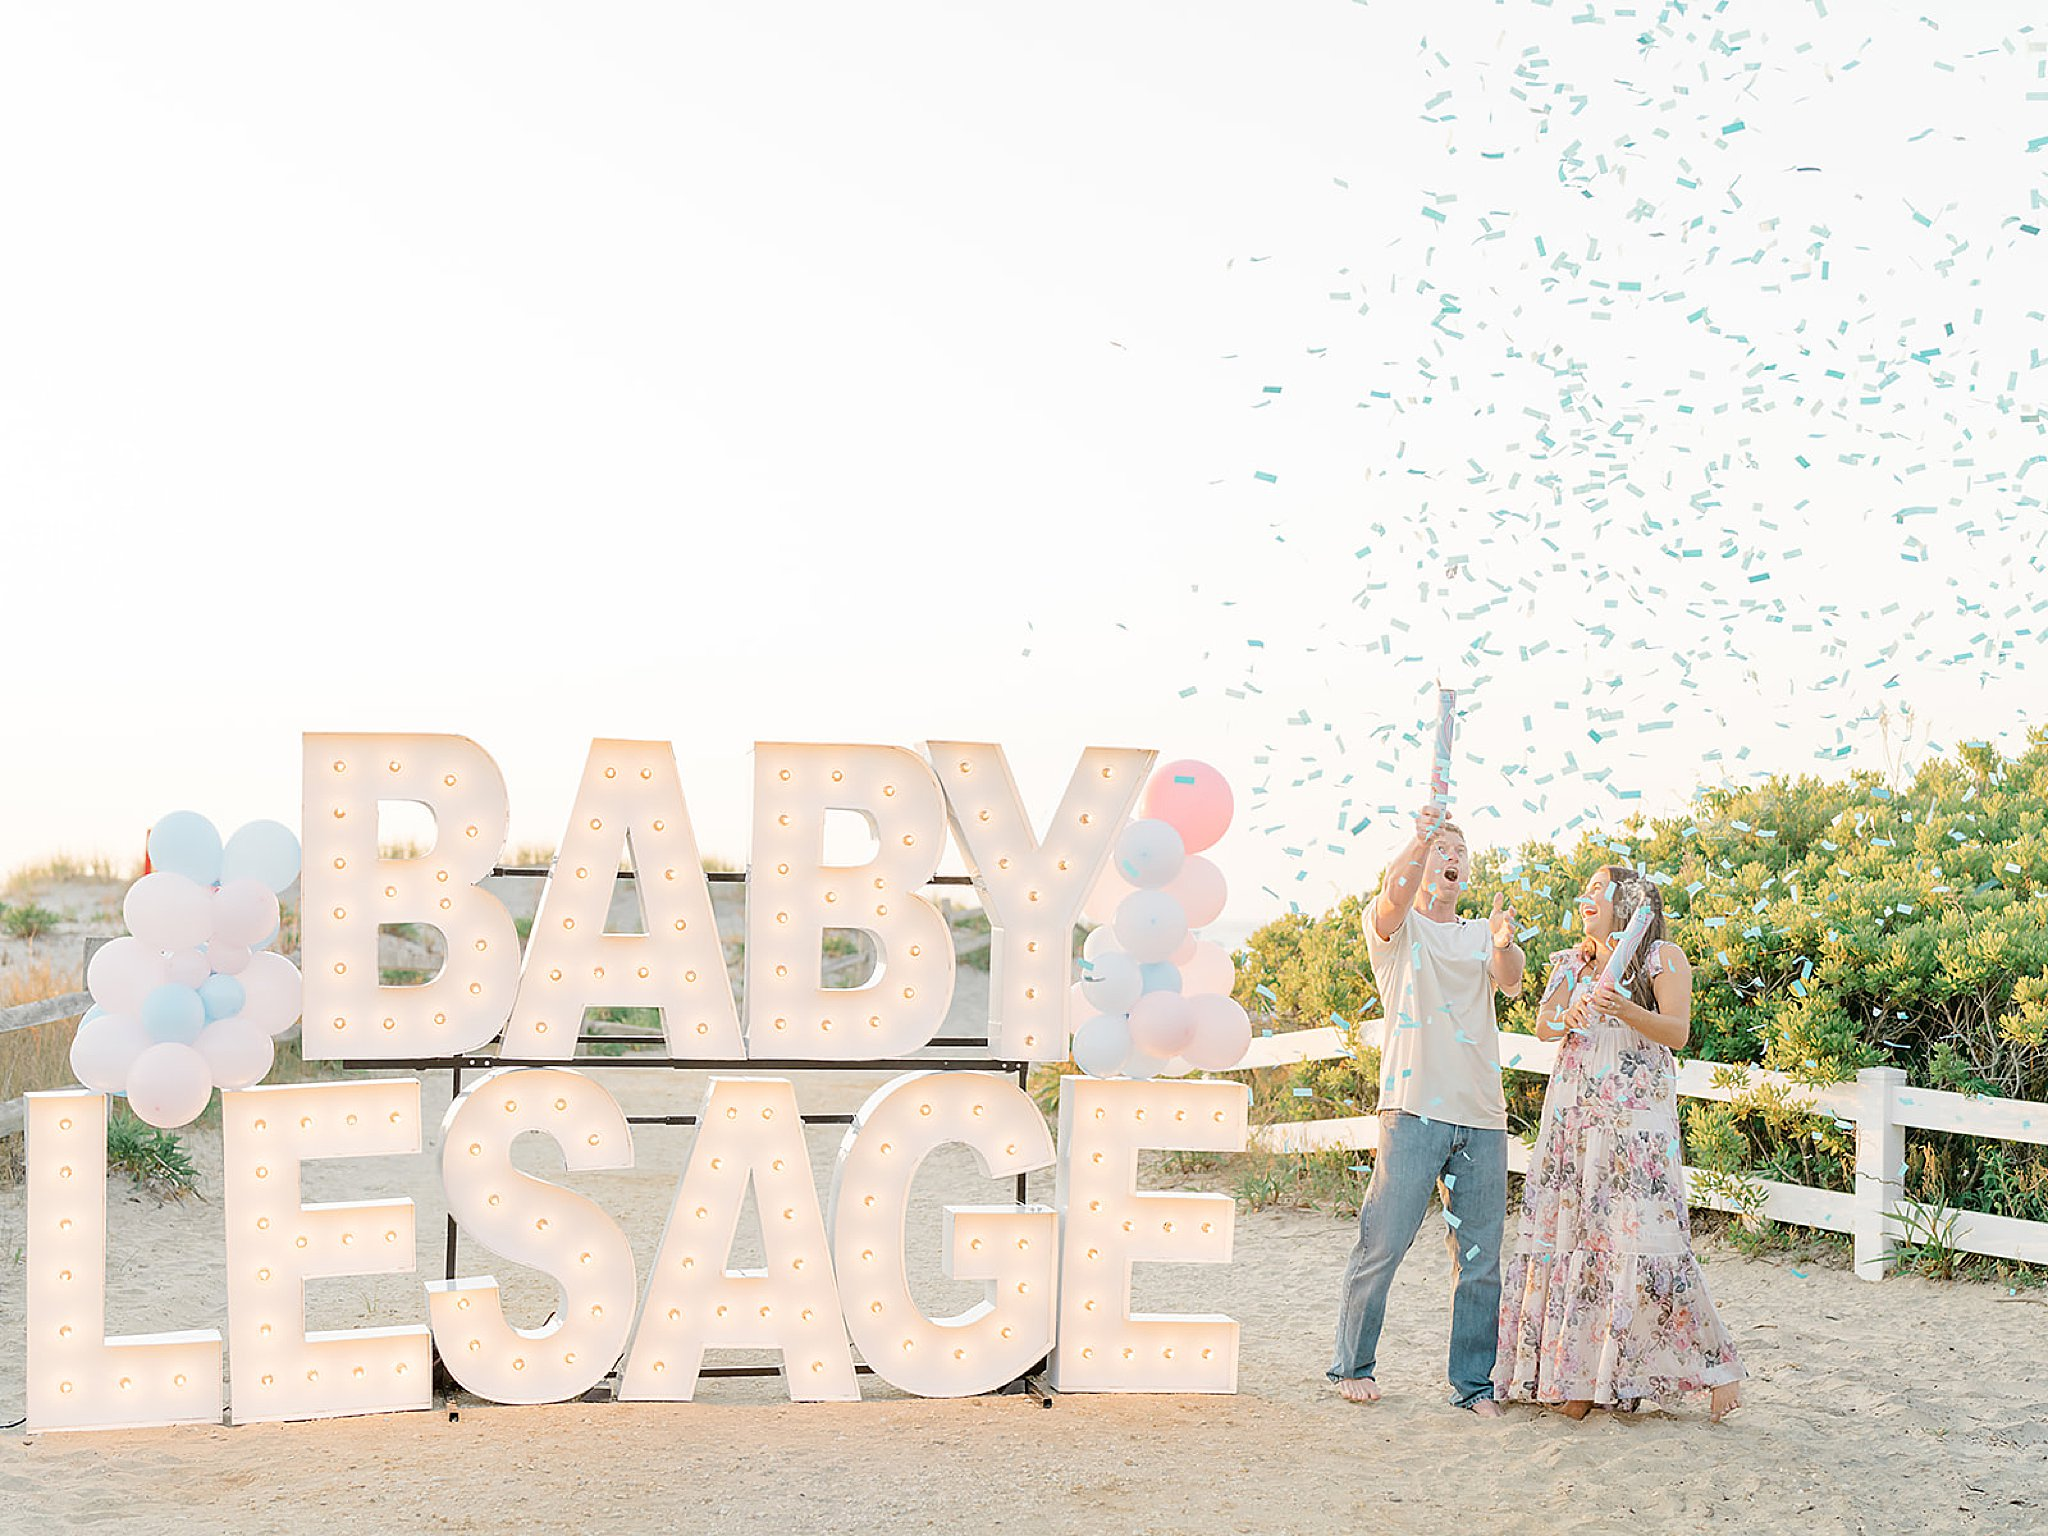 Ocean City NJ Gender Reveal Pregnancy Photography by Magdalena Studios 0007 1